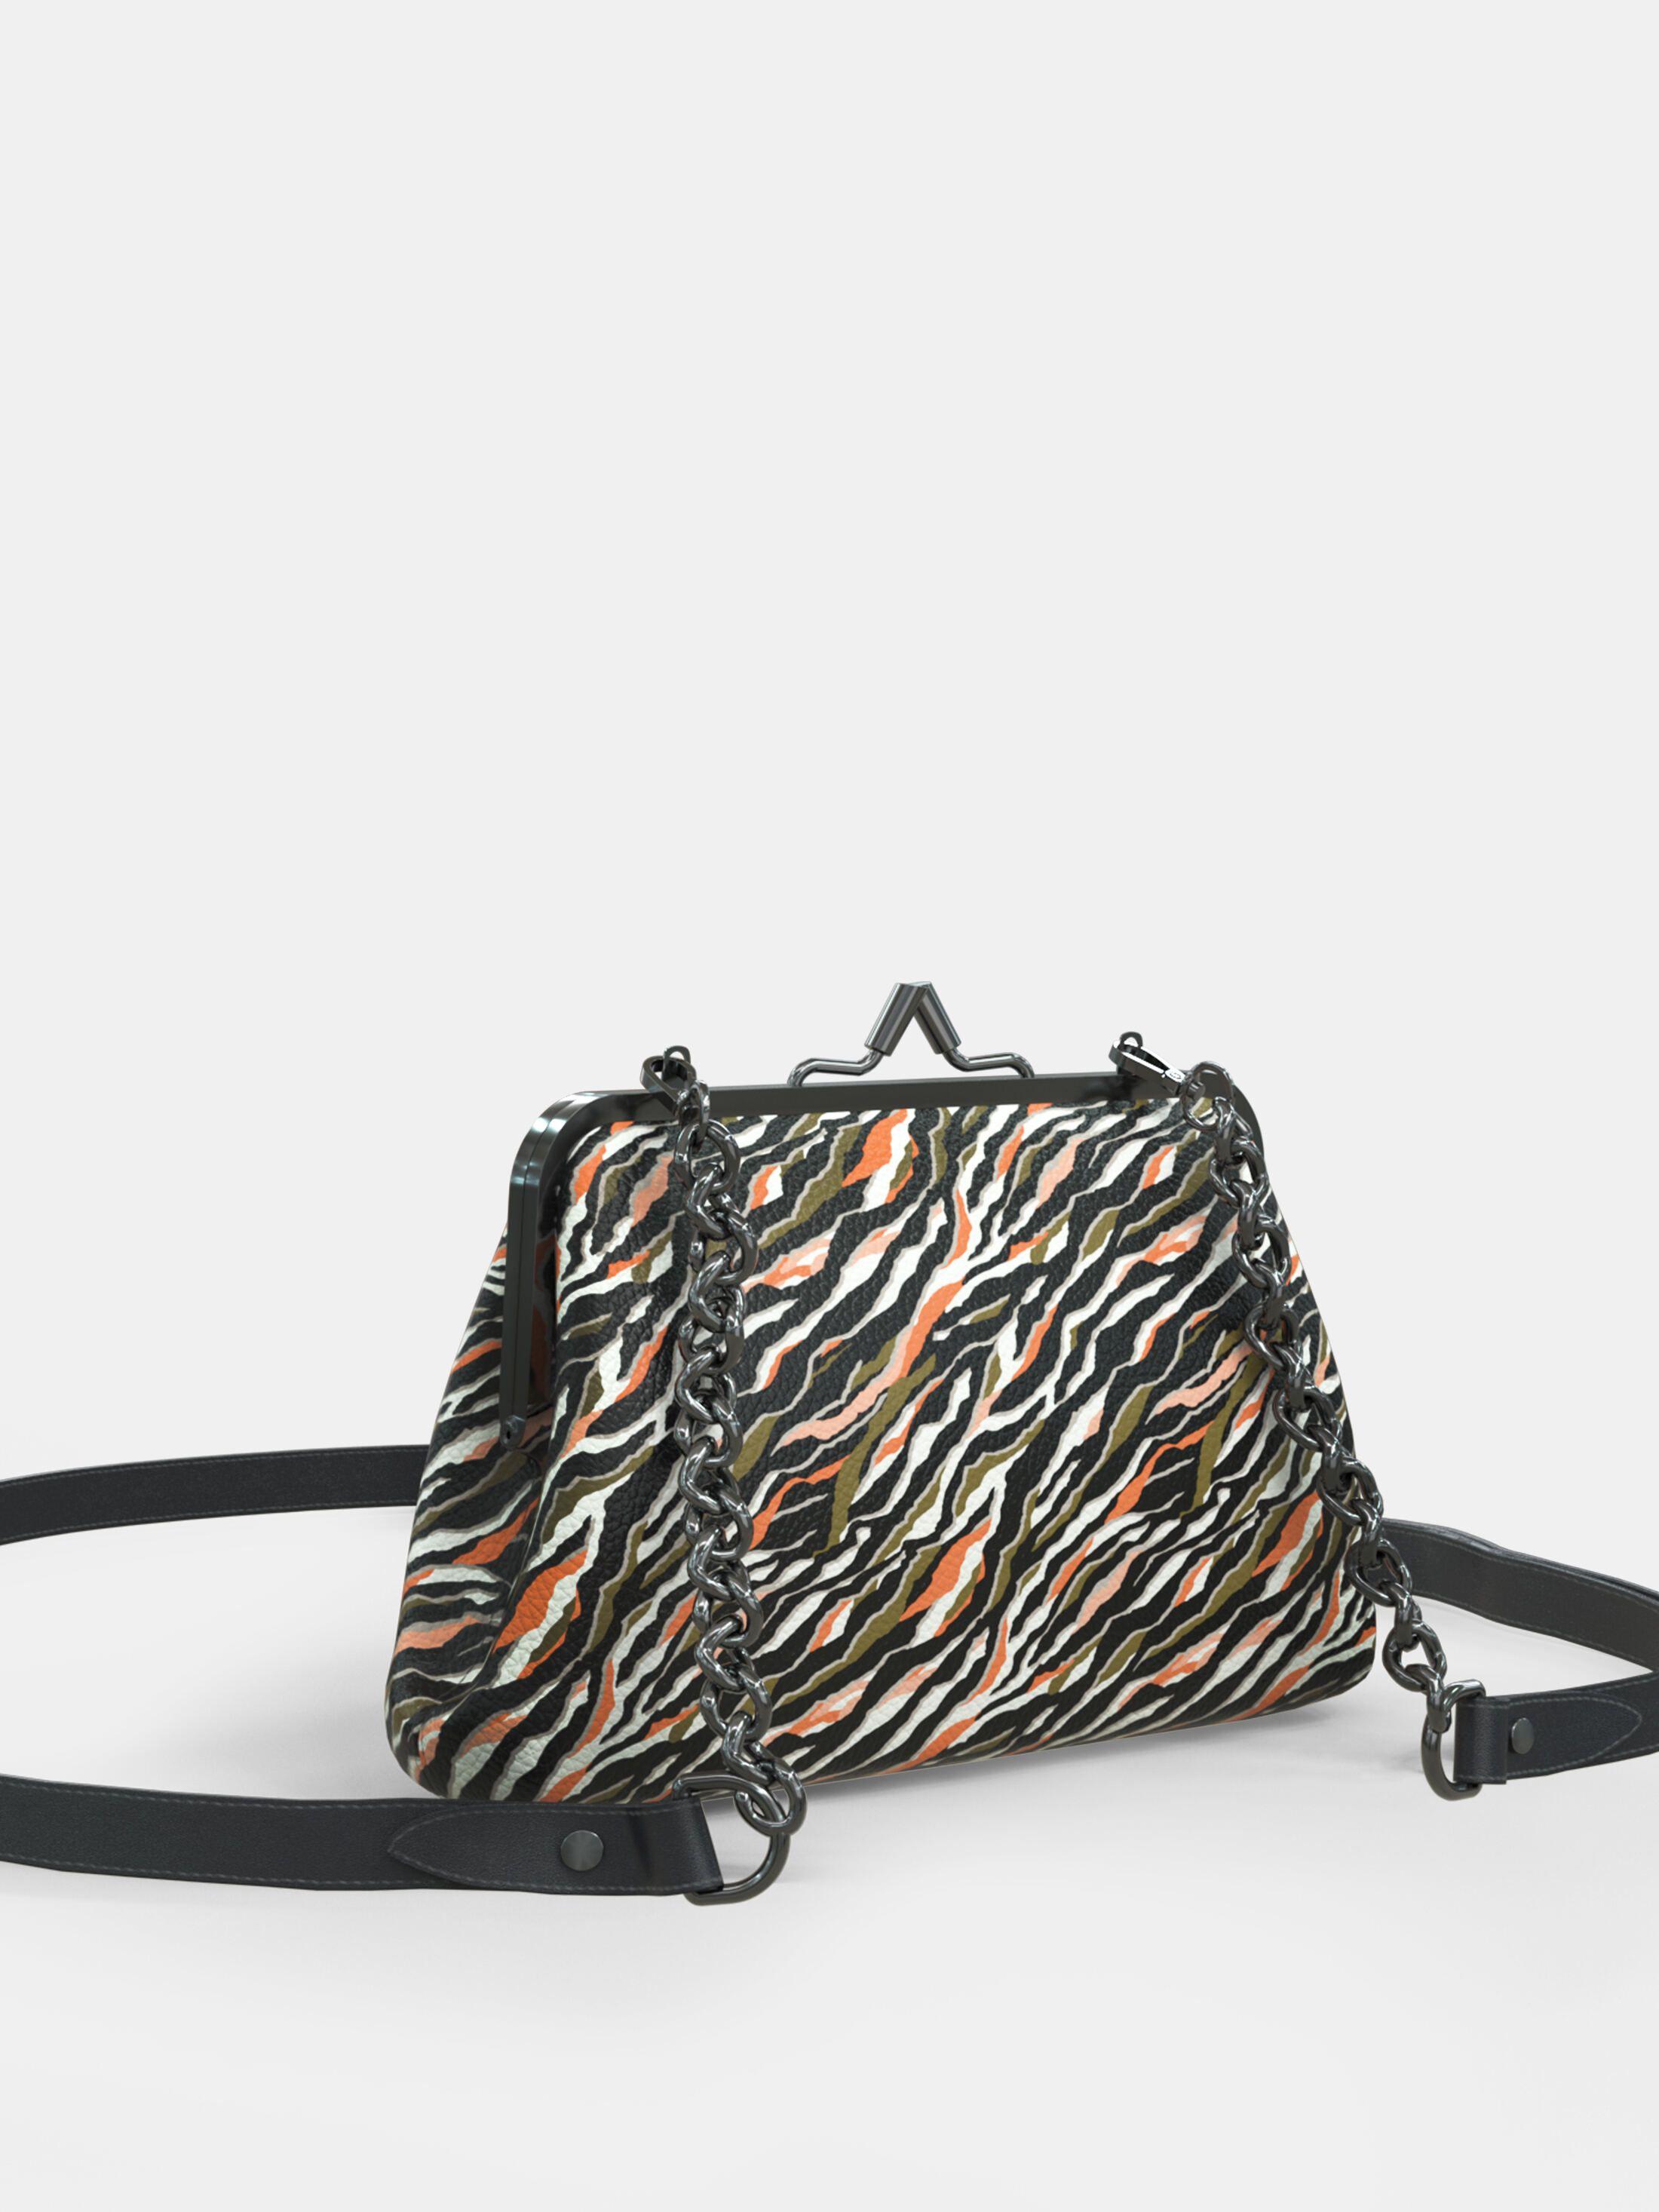 design your own metal frame clutch bag printed